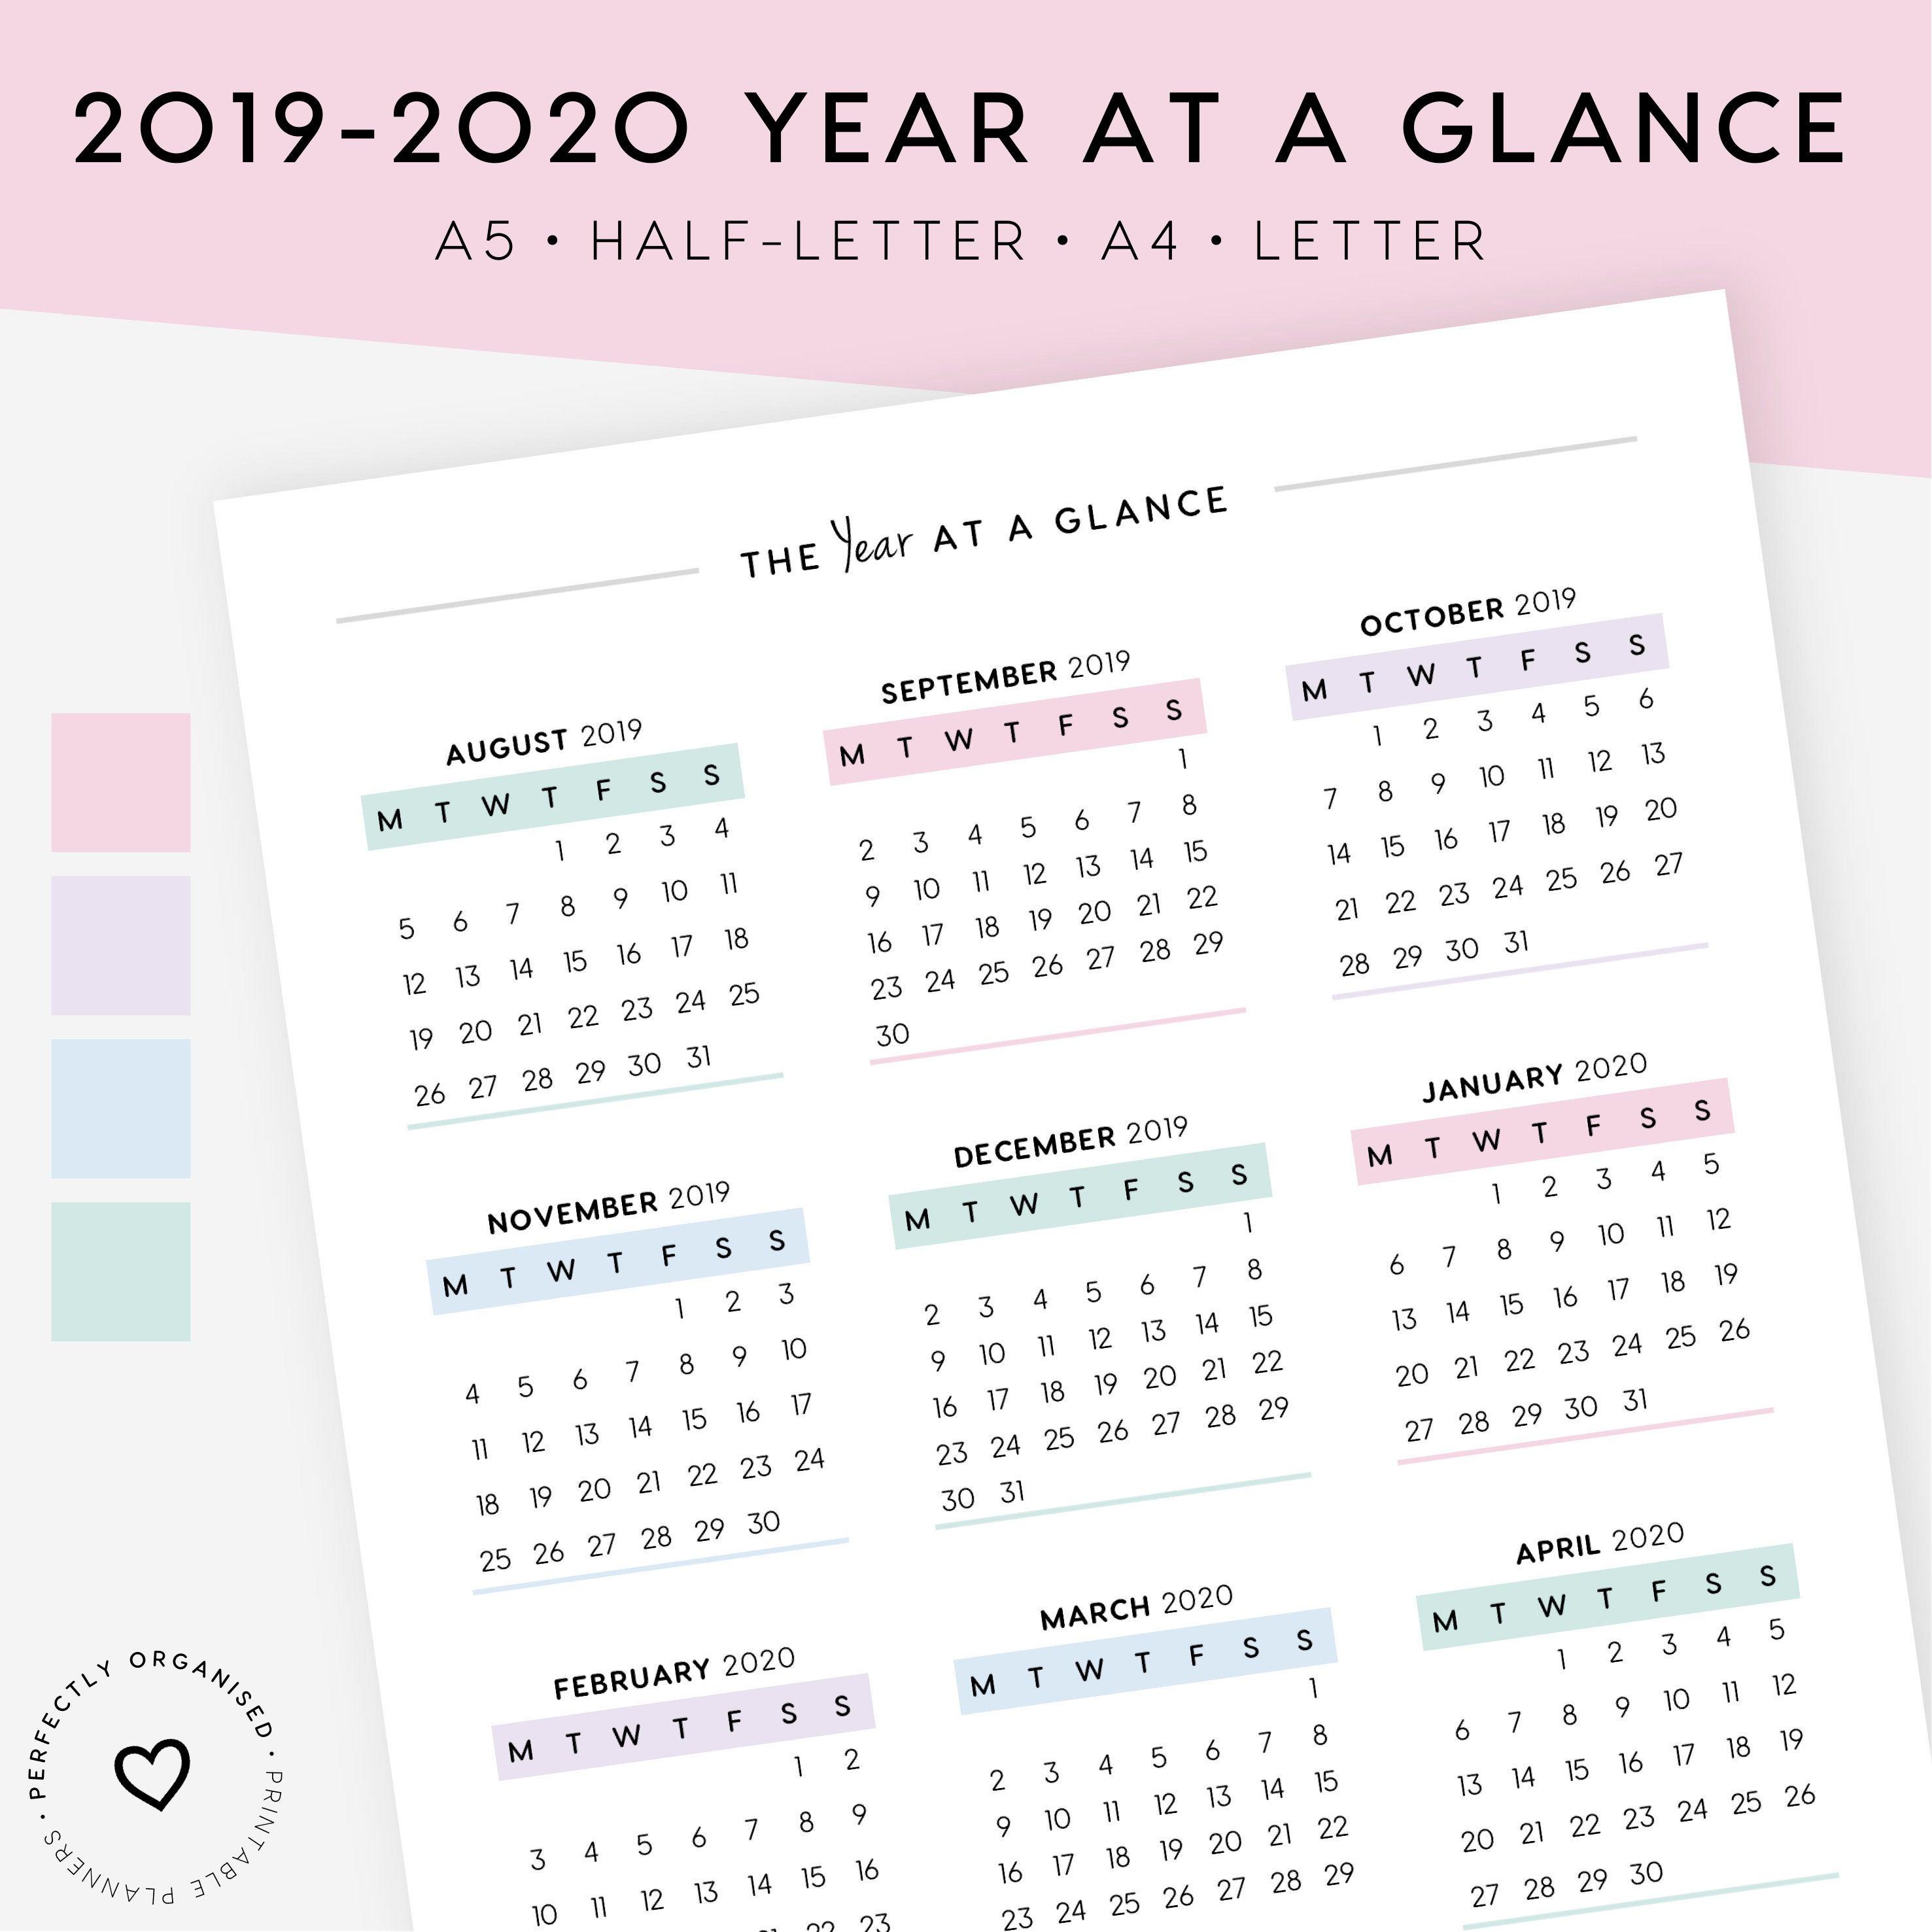 2019-2020 Academic Calendar & Important Dates Printable | 2019 Calendar,  2020 Calendar, Academic Calendar, A5, Half-Letter, A4, Letter within 2019- 2020 Academic Calendar Printable Empty Boxes